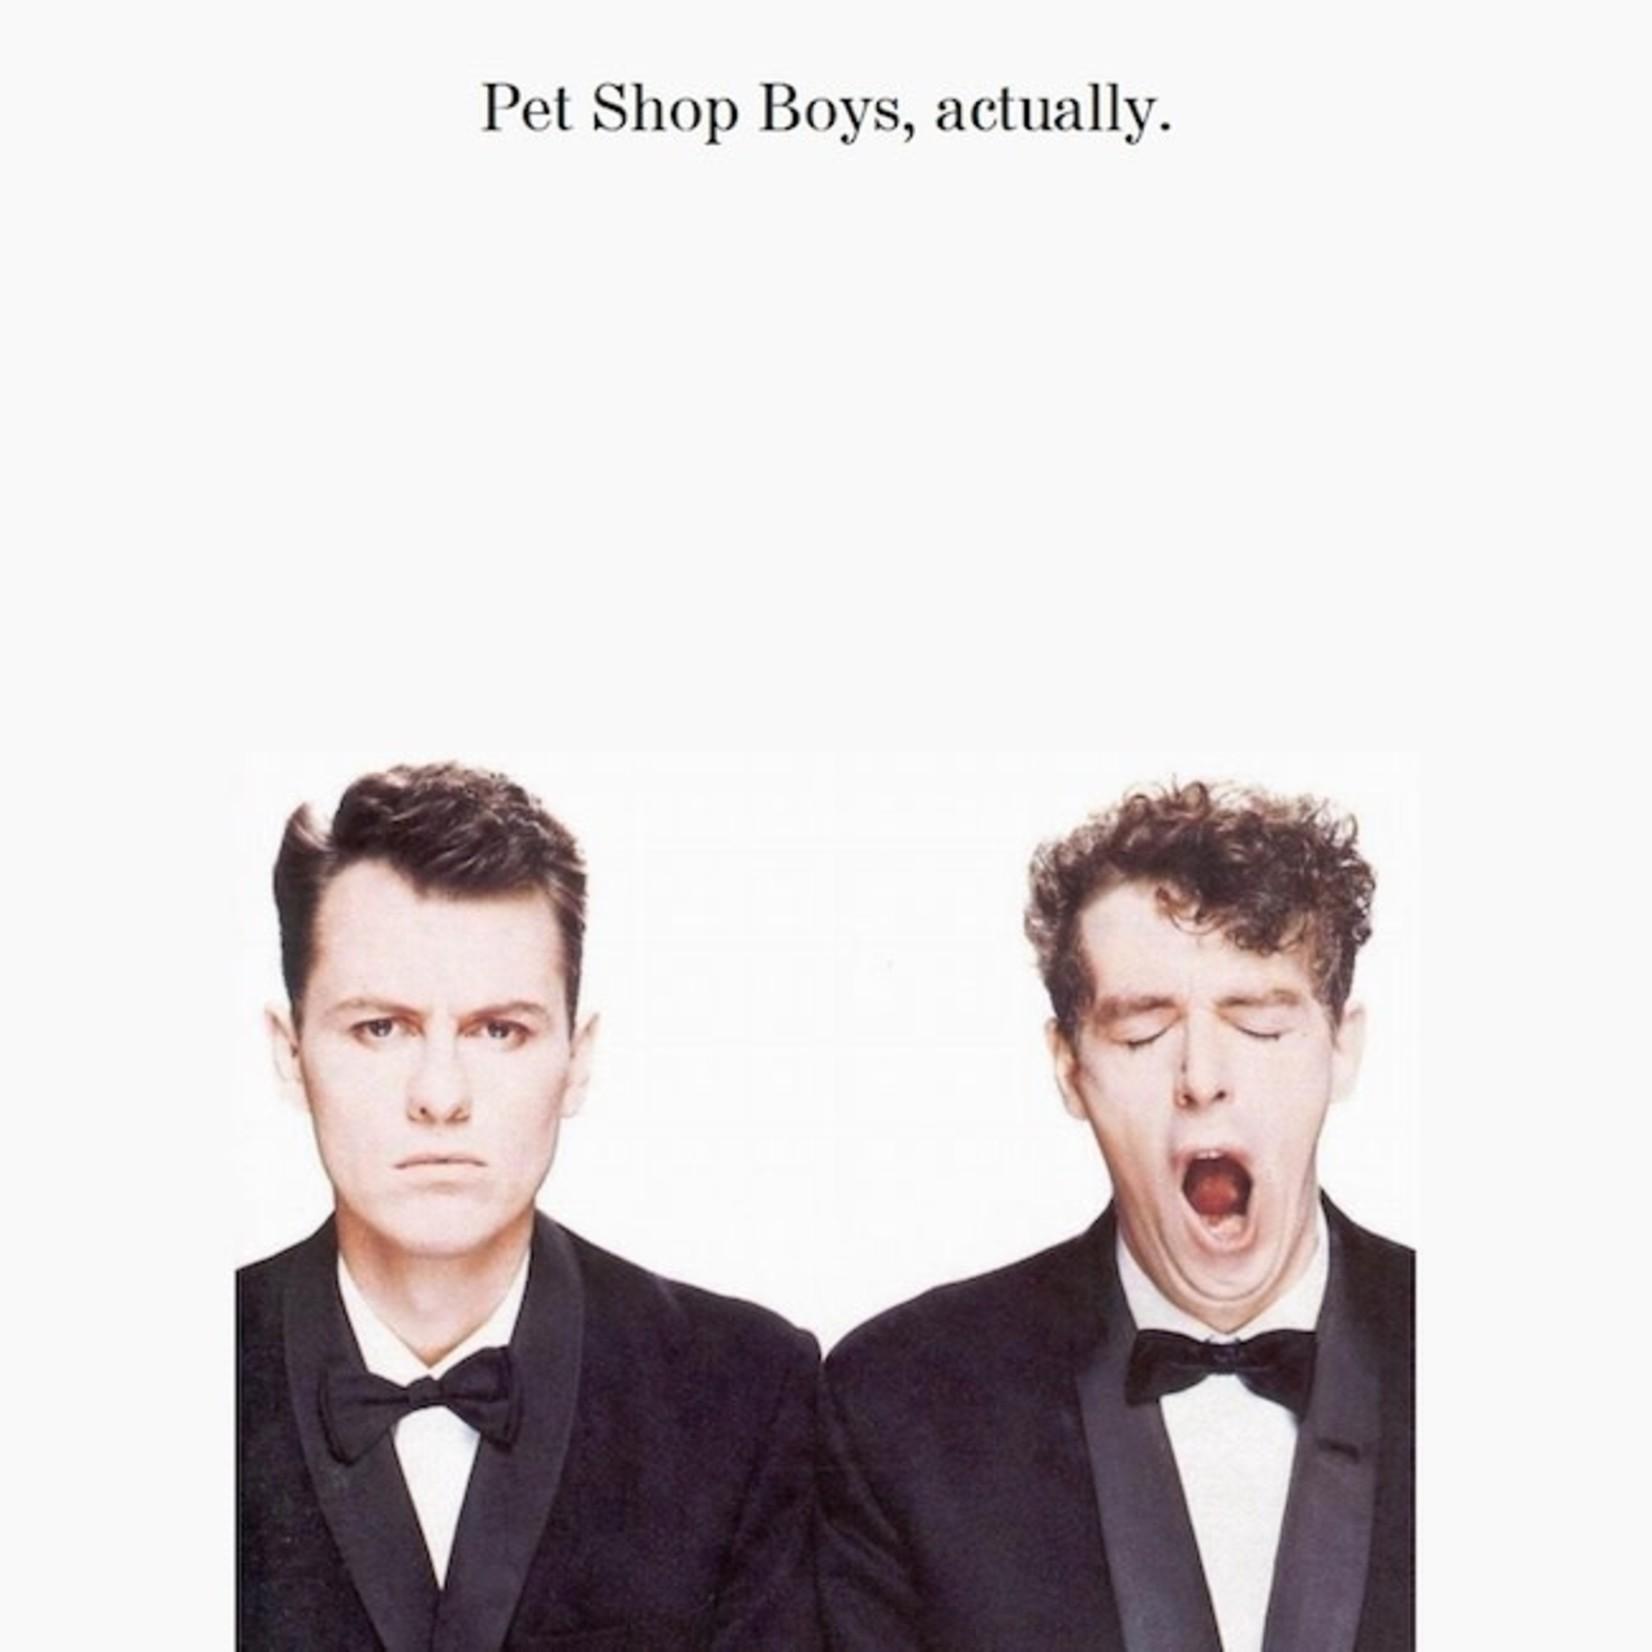 [Vintage] Pet Shop Boys: Actually